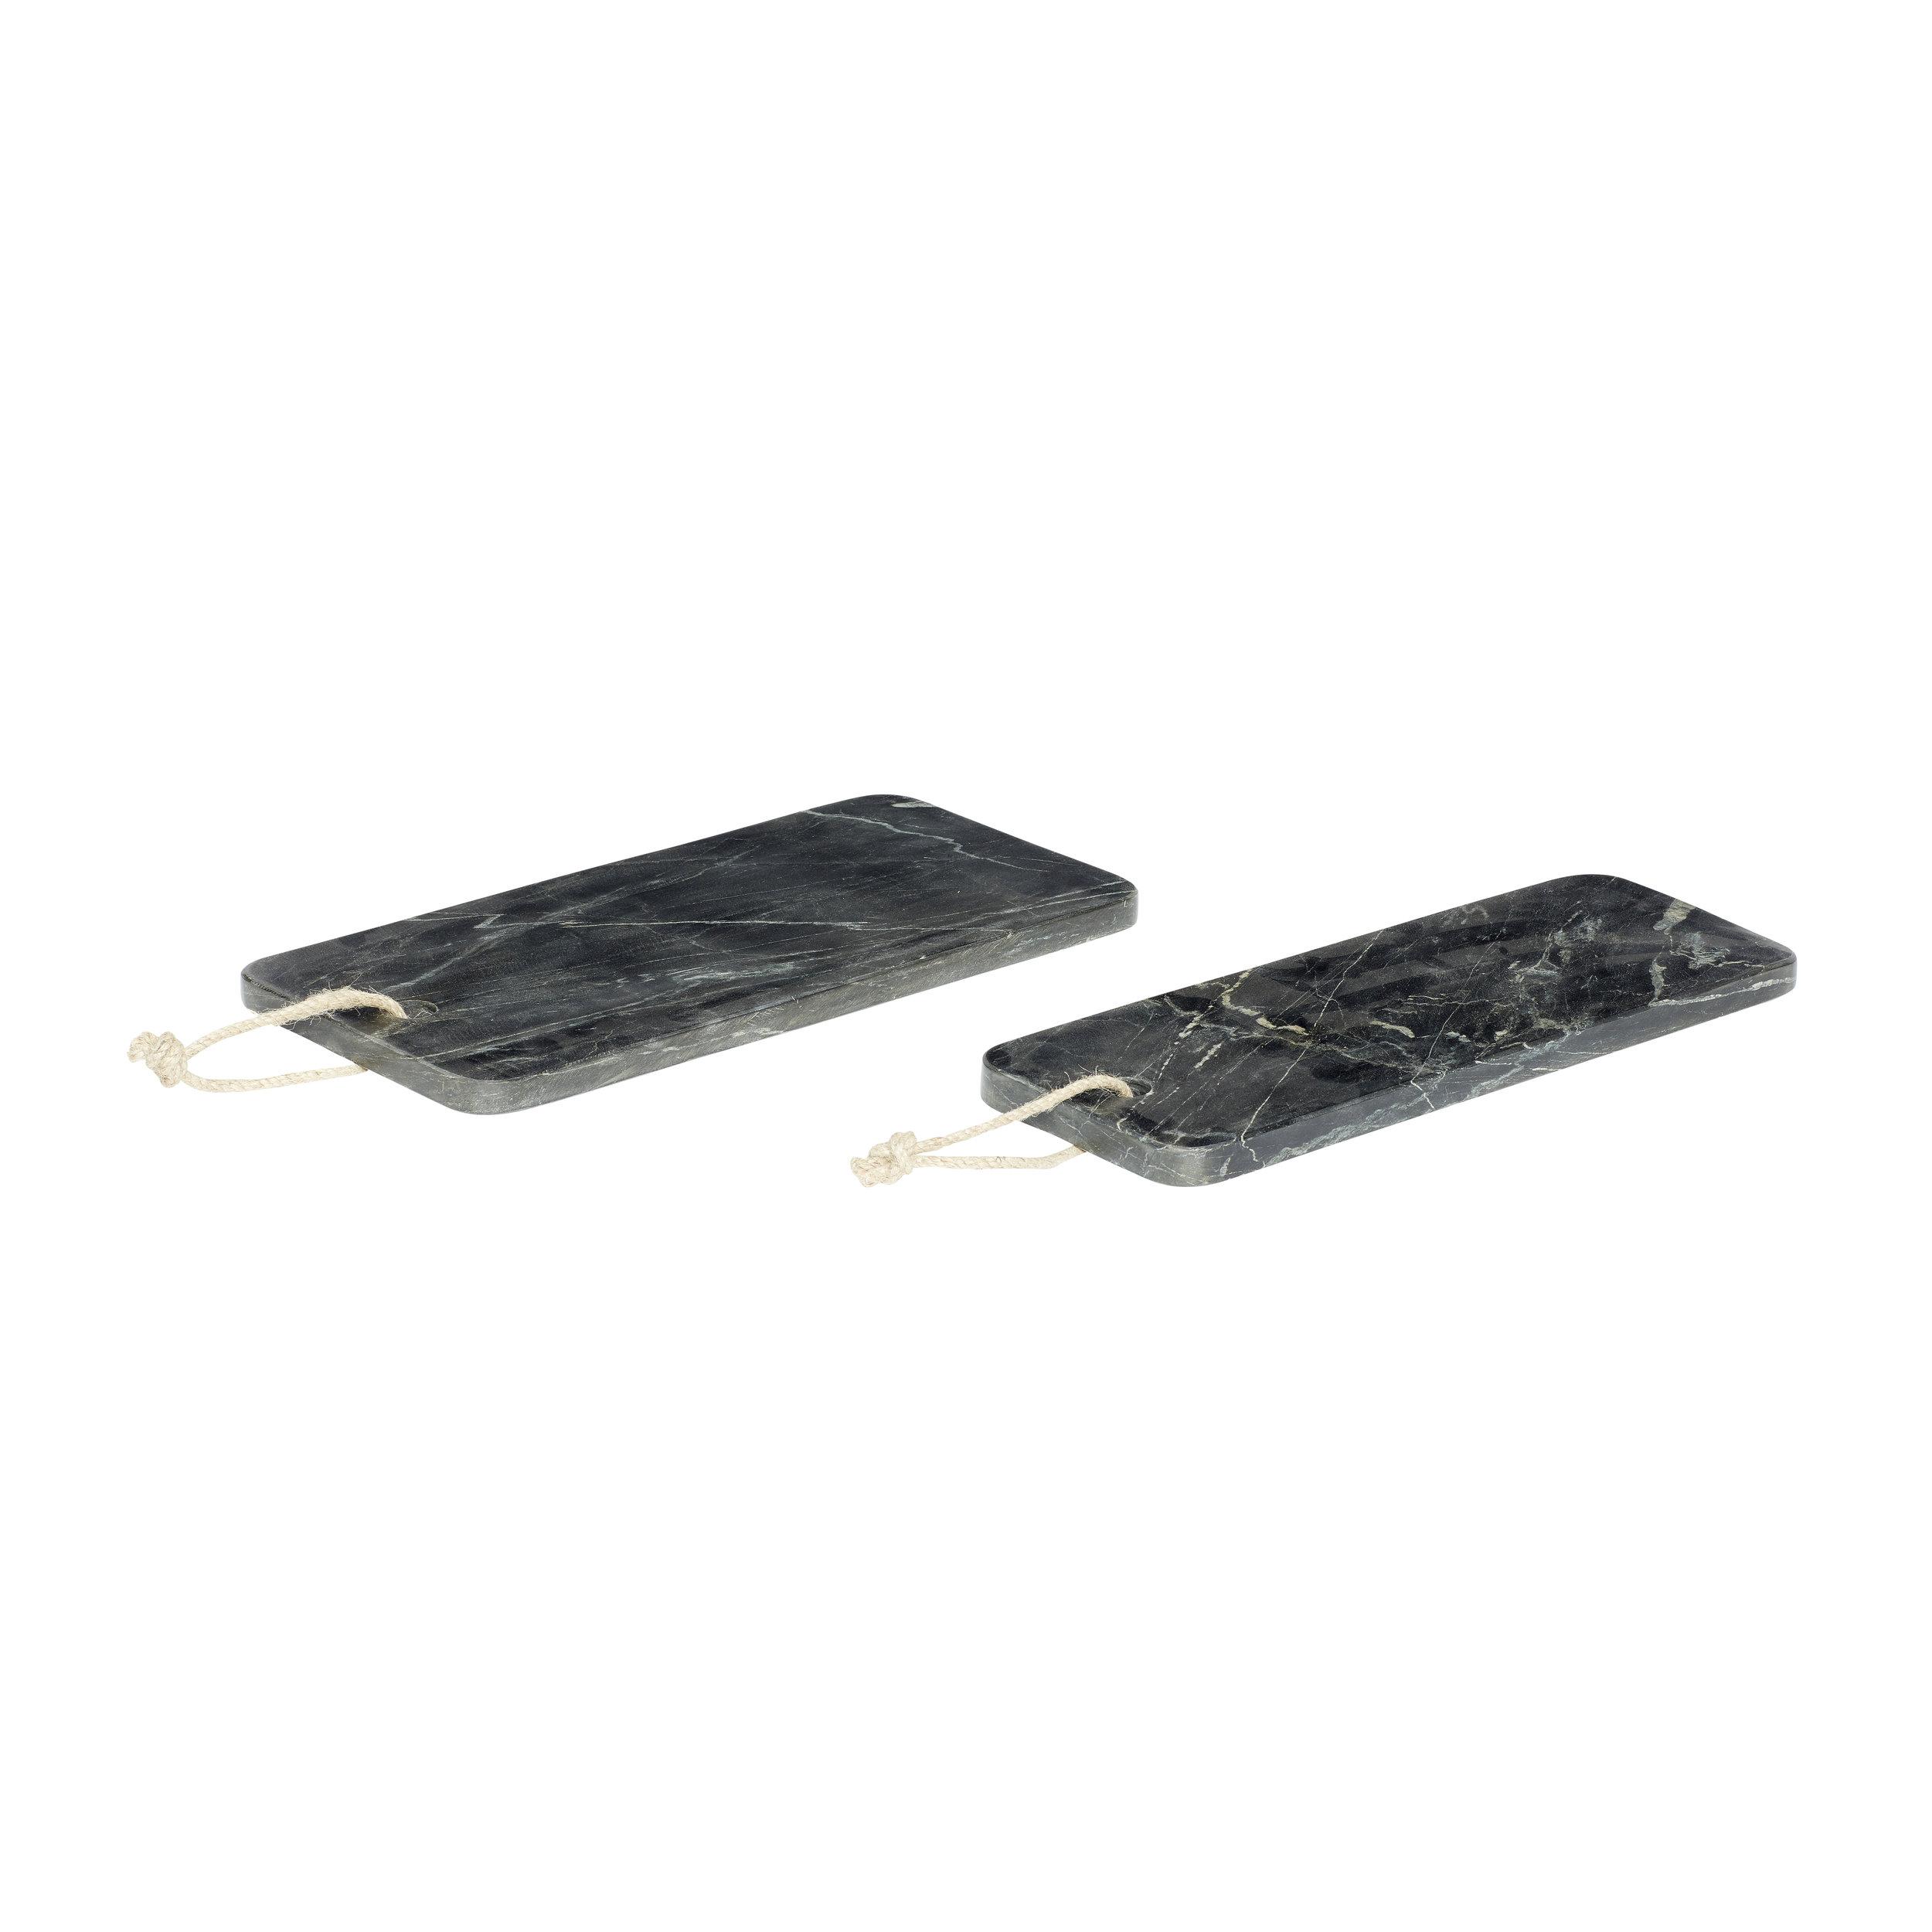 #016   Black Marble Serving Board Set   36cmx17cmxH:2cm,36cmx13cmxH:2cm Hire Price - £9 per set  Minimum Order 3 per set  Current Stock Available 12 per set